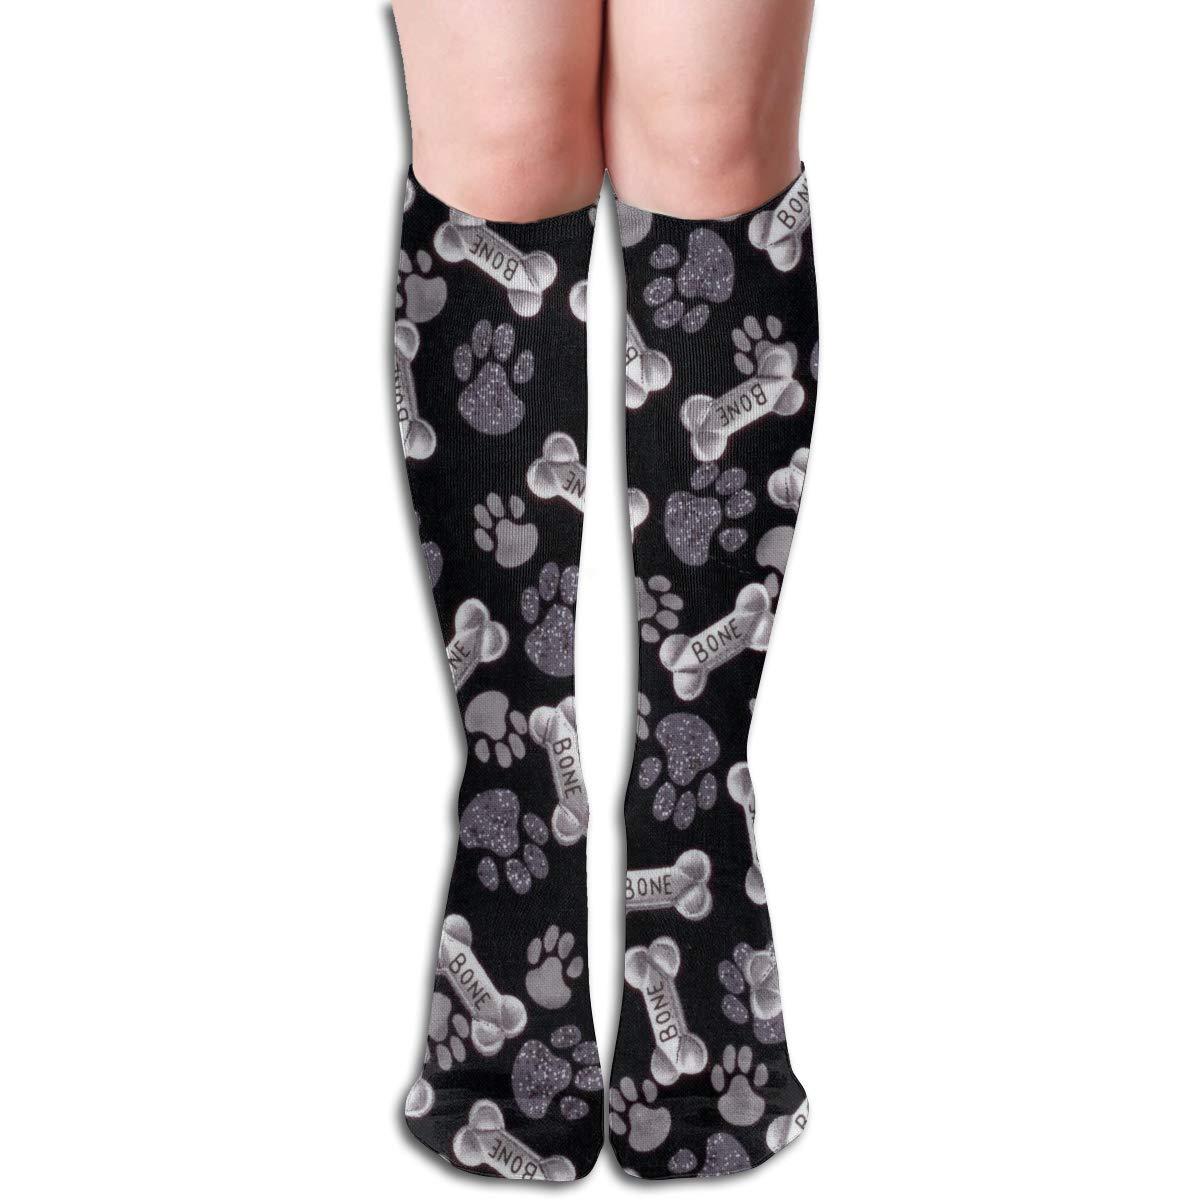 Girls Socks Mid-Calf Merry Christmas Beach Winter Inspiring For Halloween